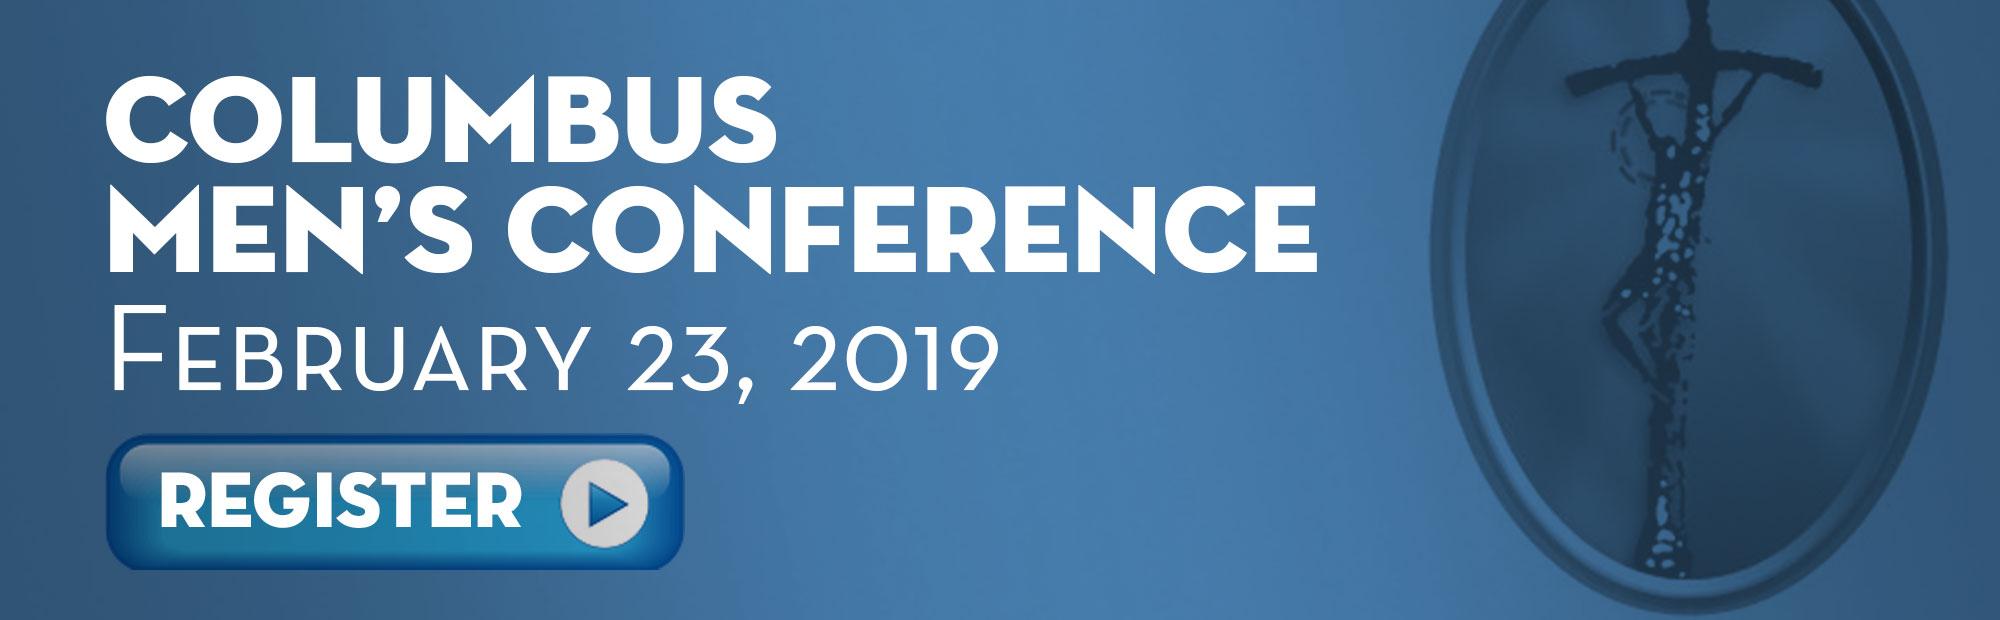 Register for the Columbus Men's Conference